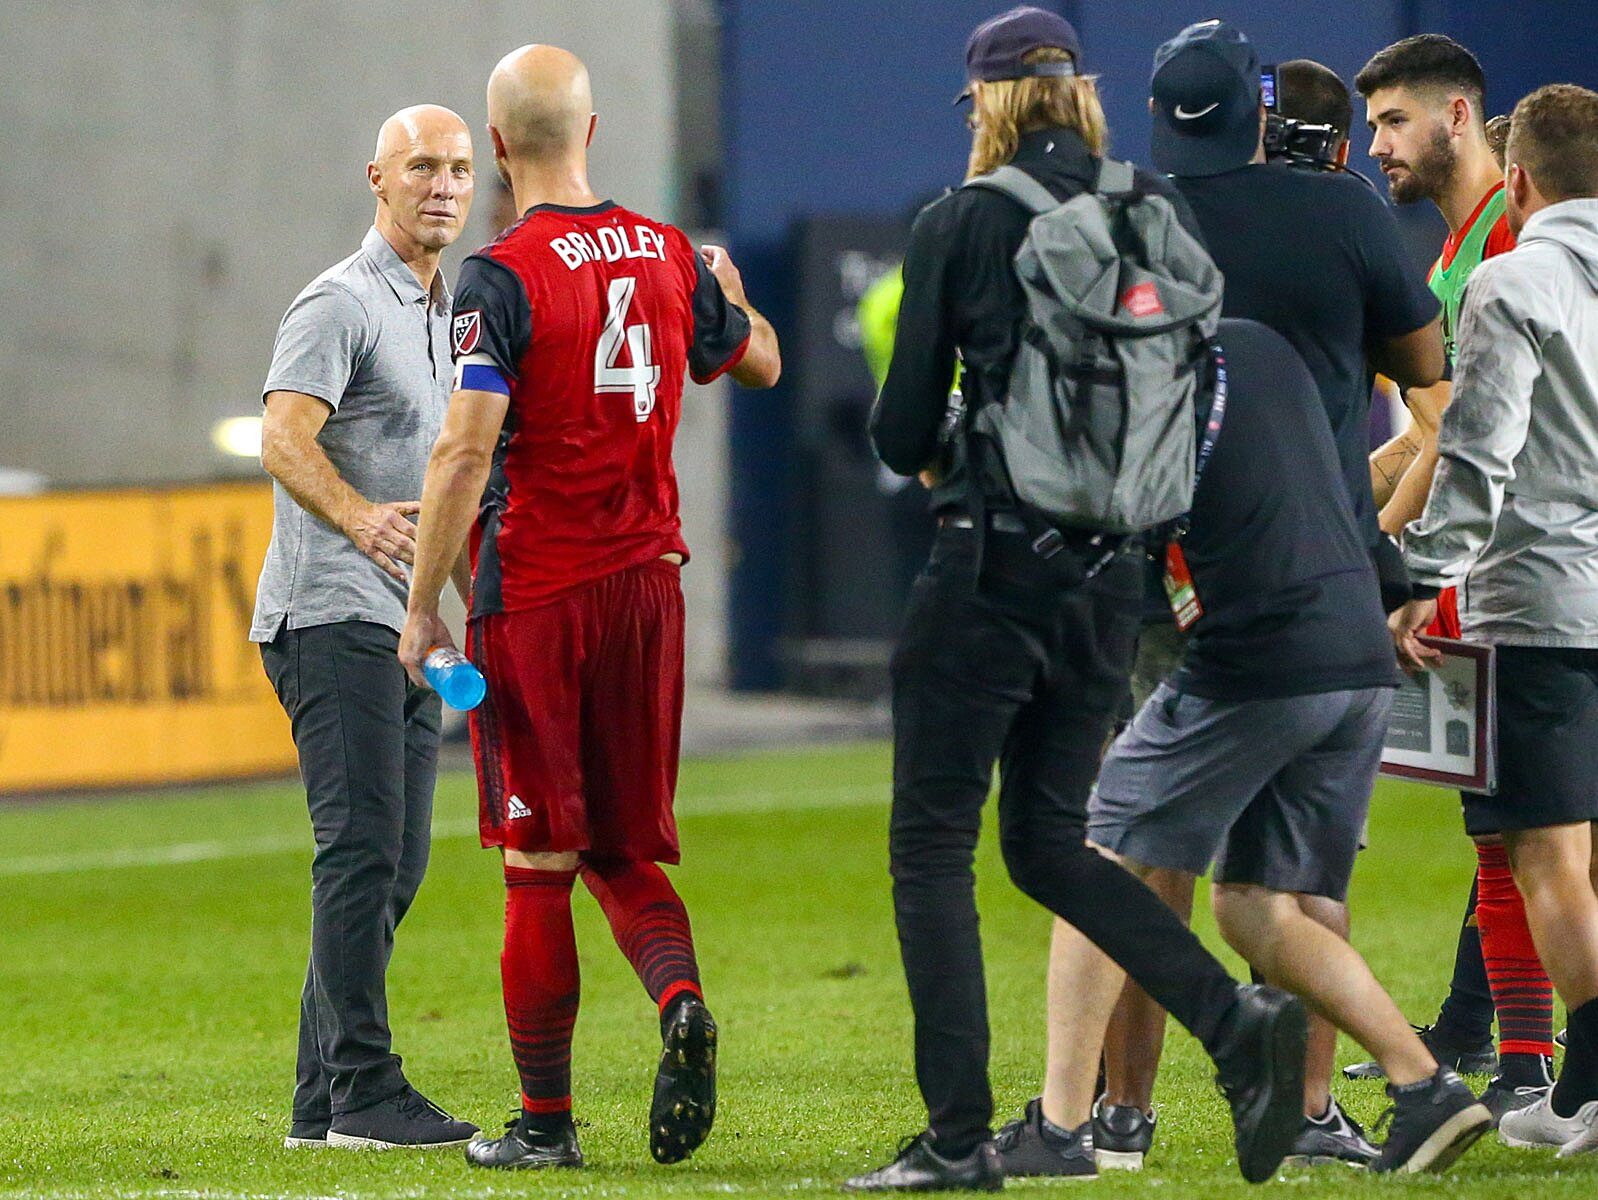 4388004fb7d MLS Week 27: RSL's duck, goals steal show; Galaxy, TFC in trouble | SI.com